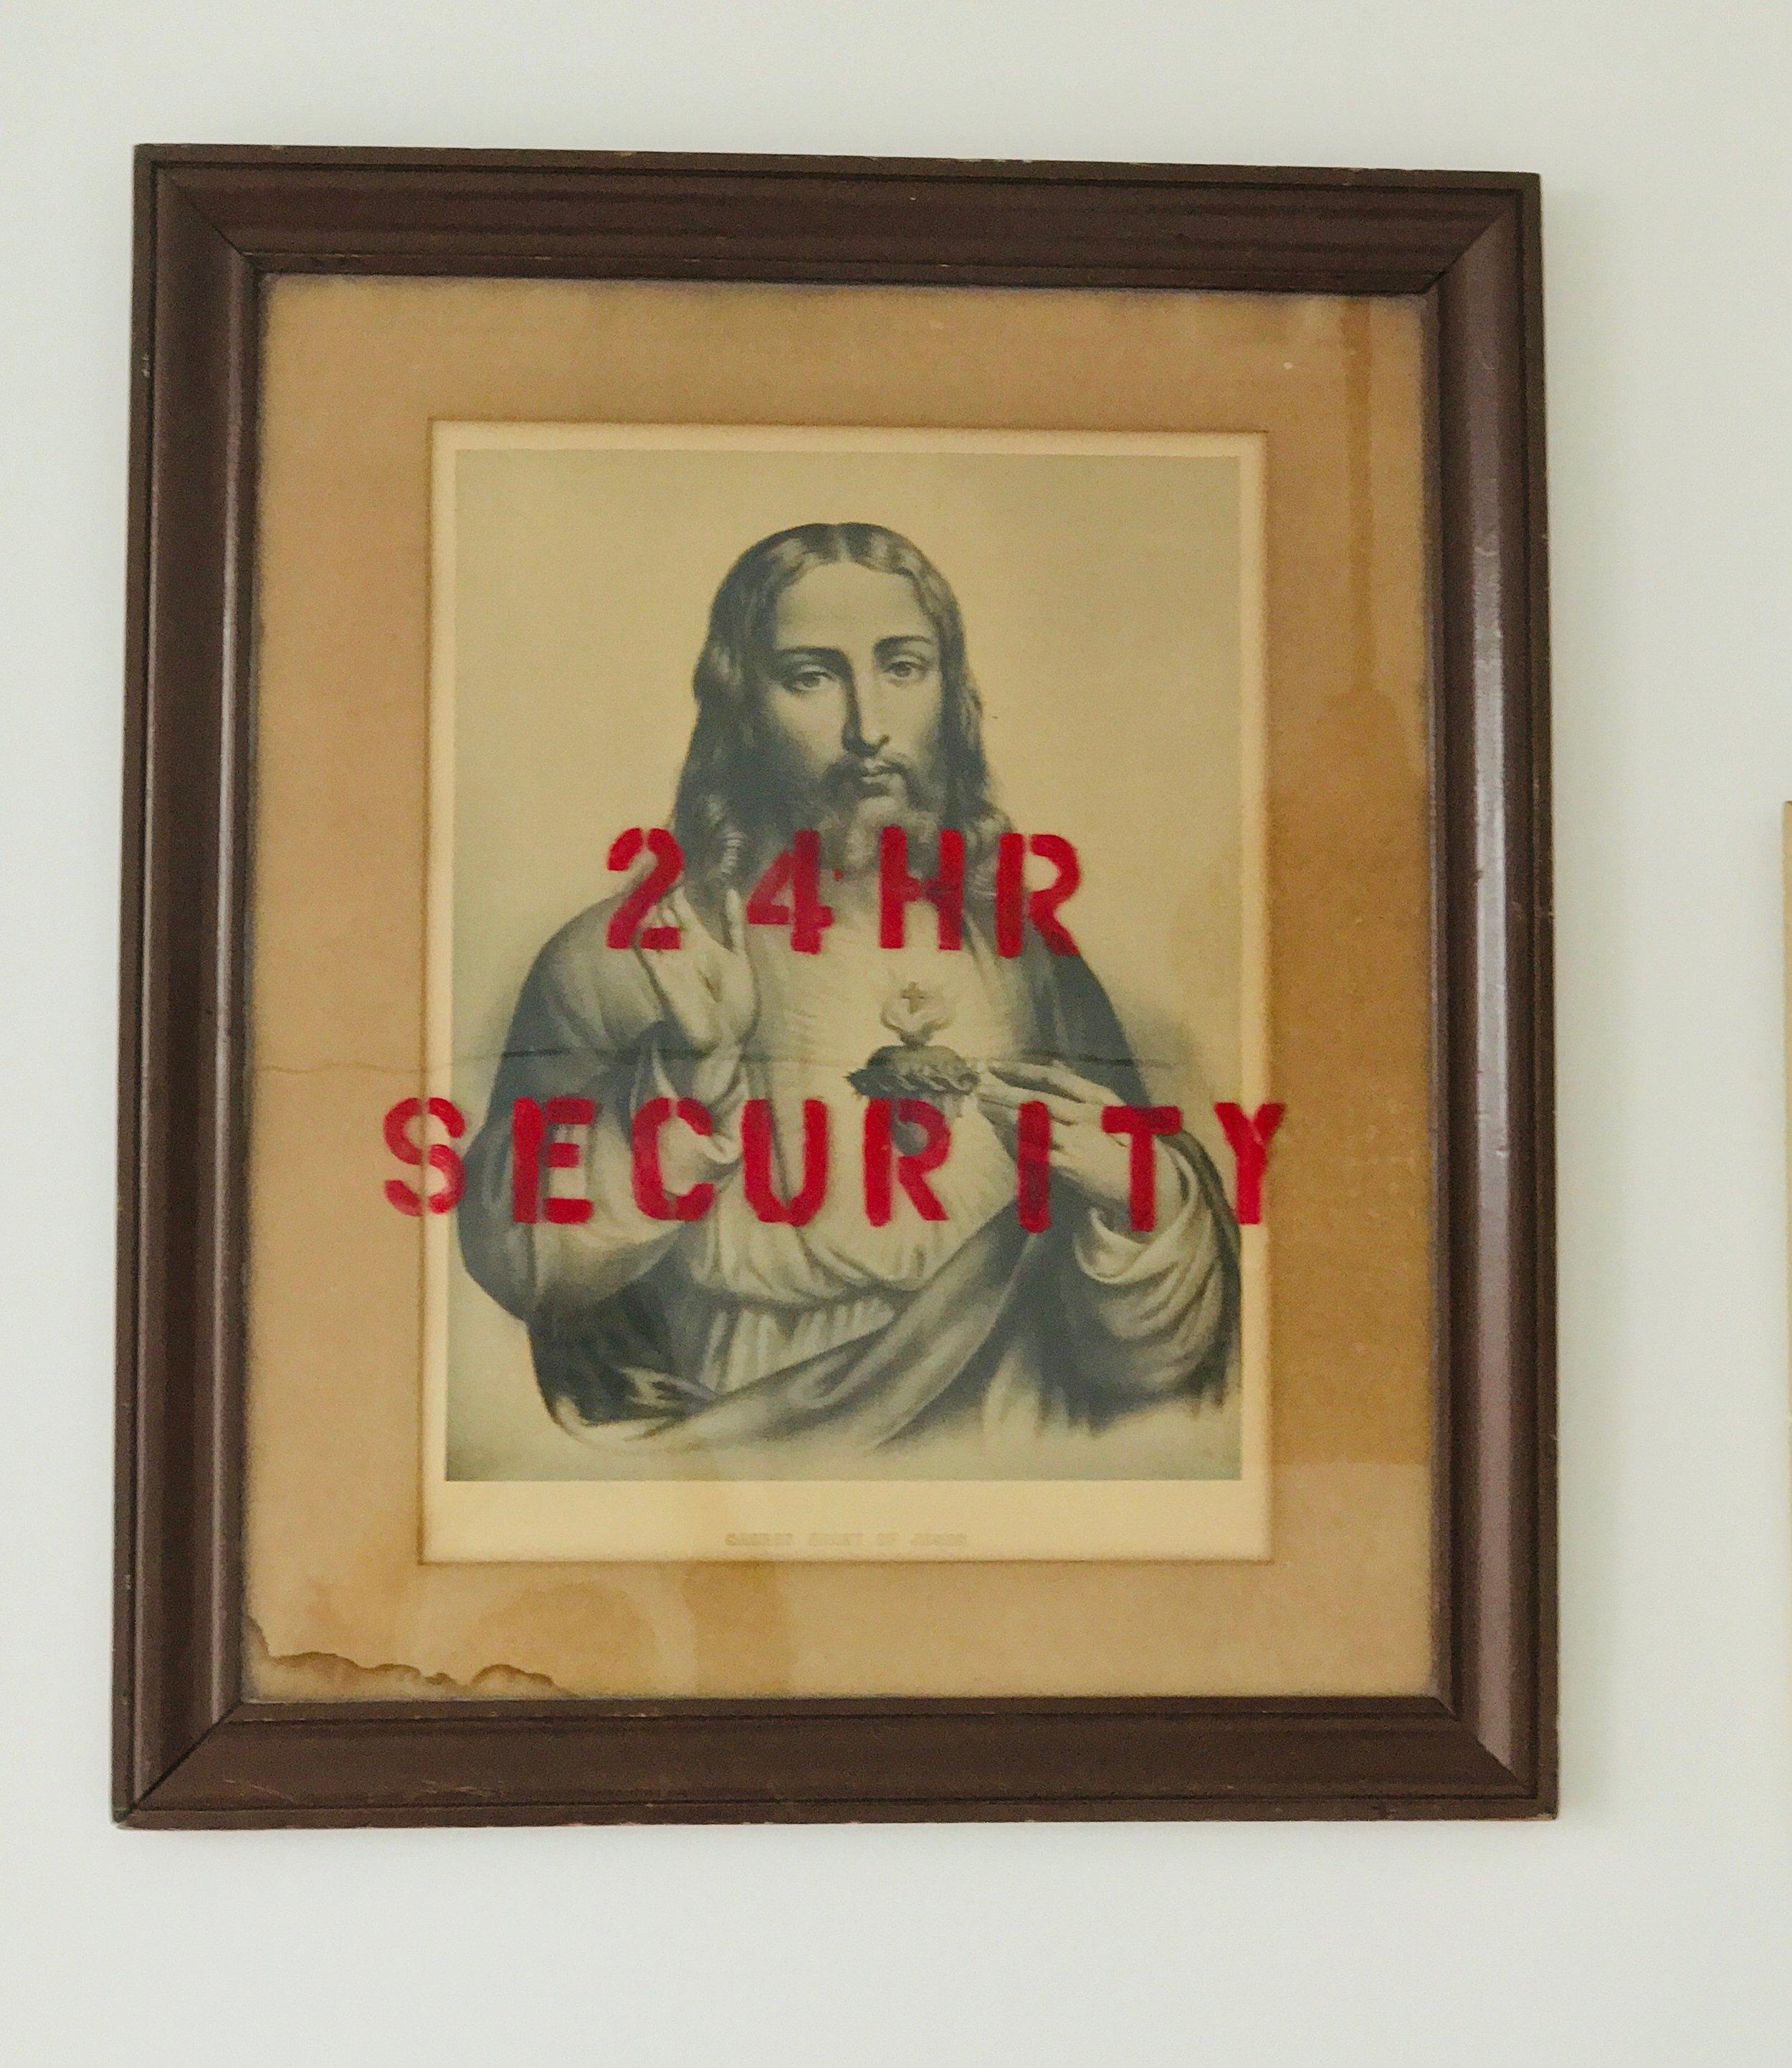 24 HR SECURITY